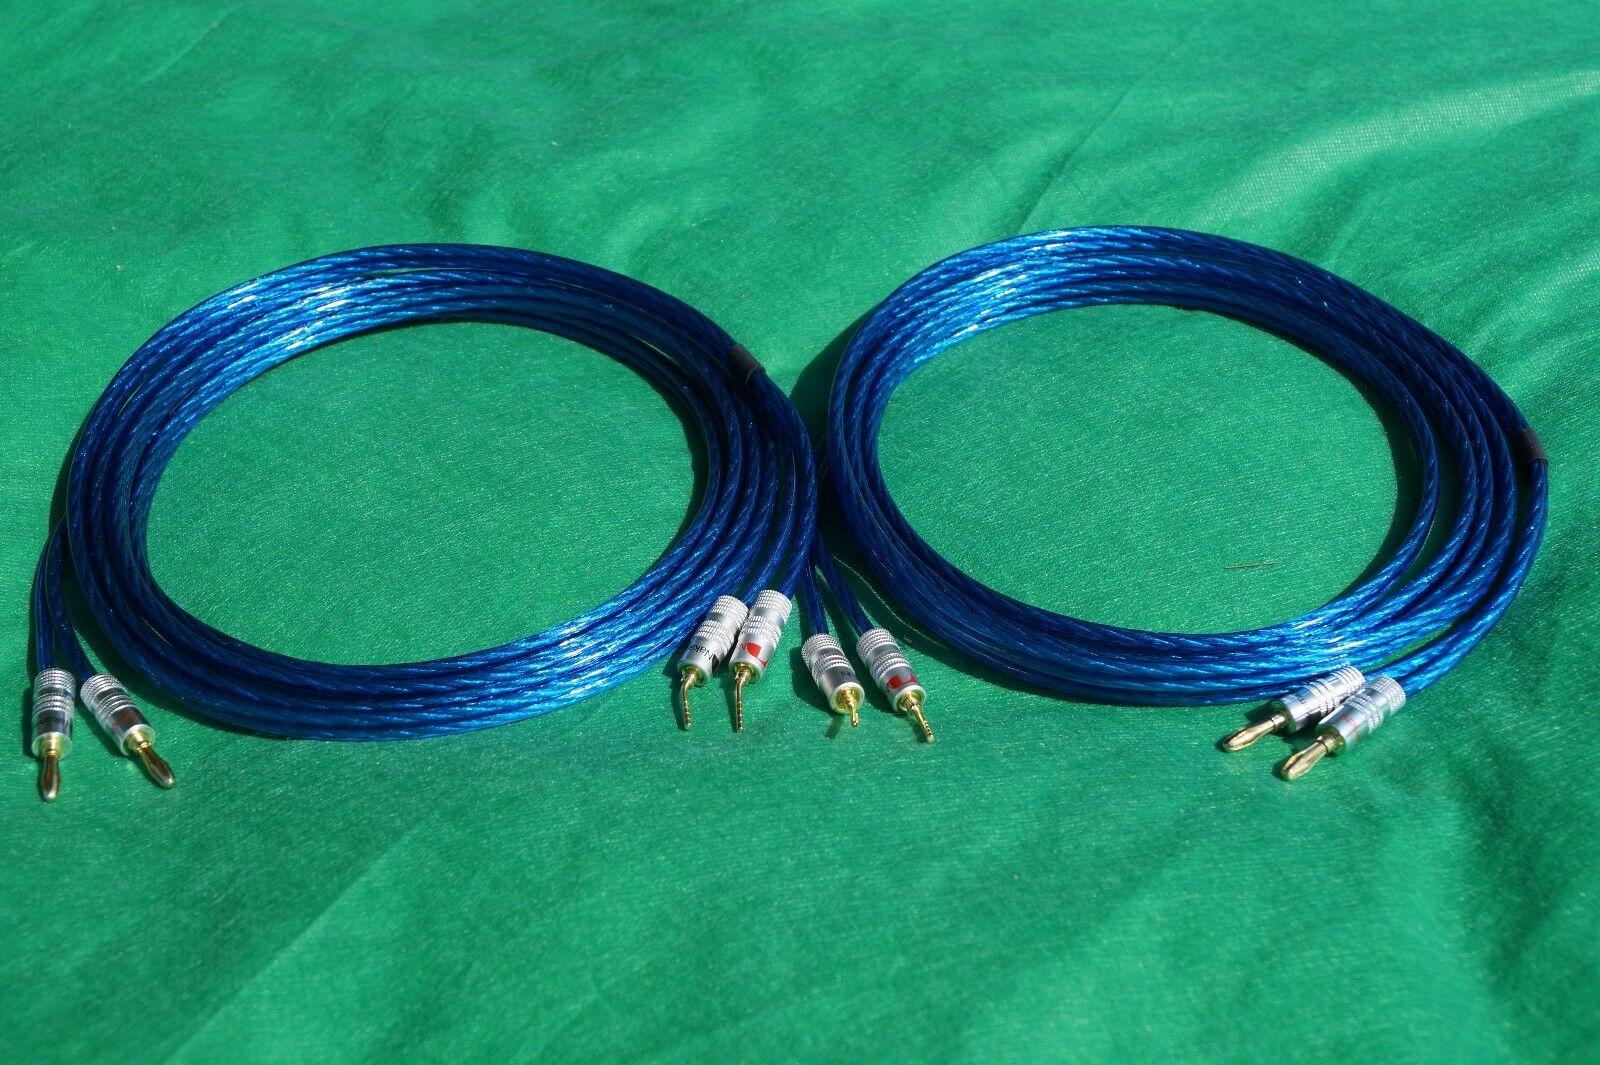 Samurai True 10 Gauge Wire Speaker Cable Banana to Angle Pin Plugs ...